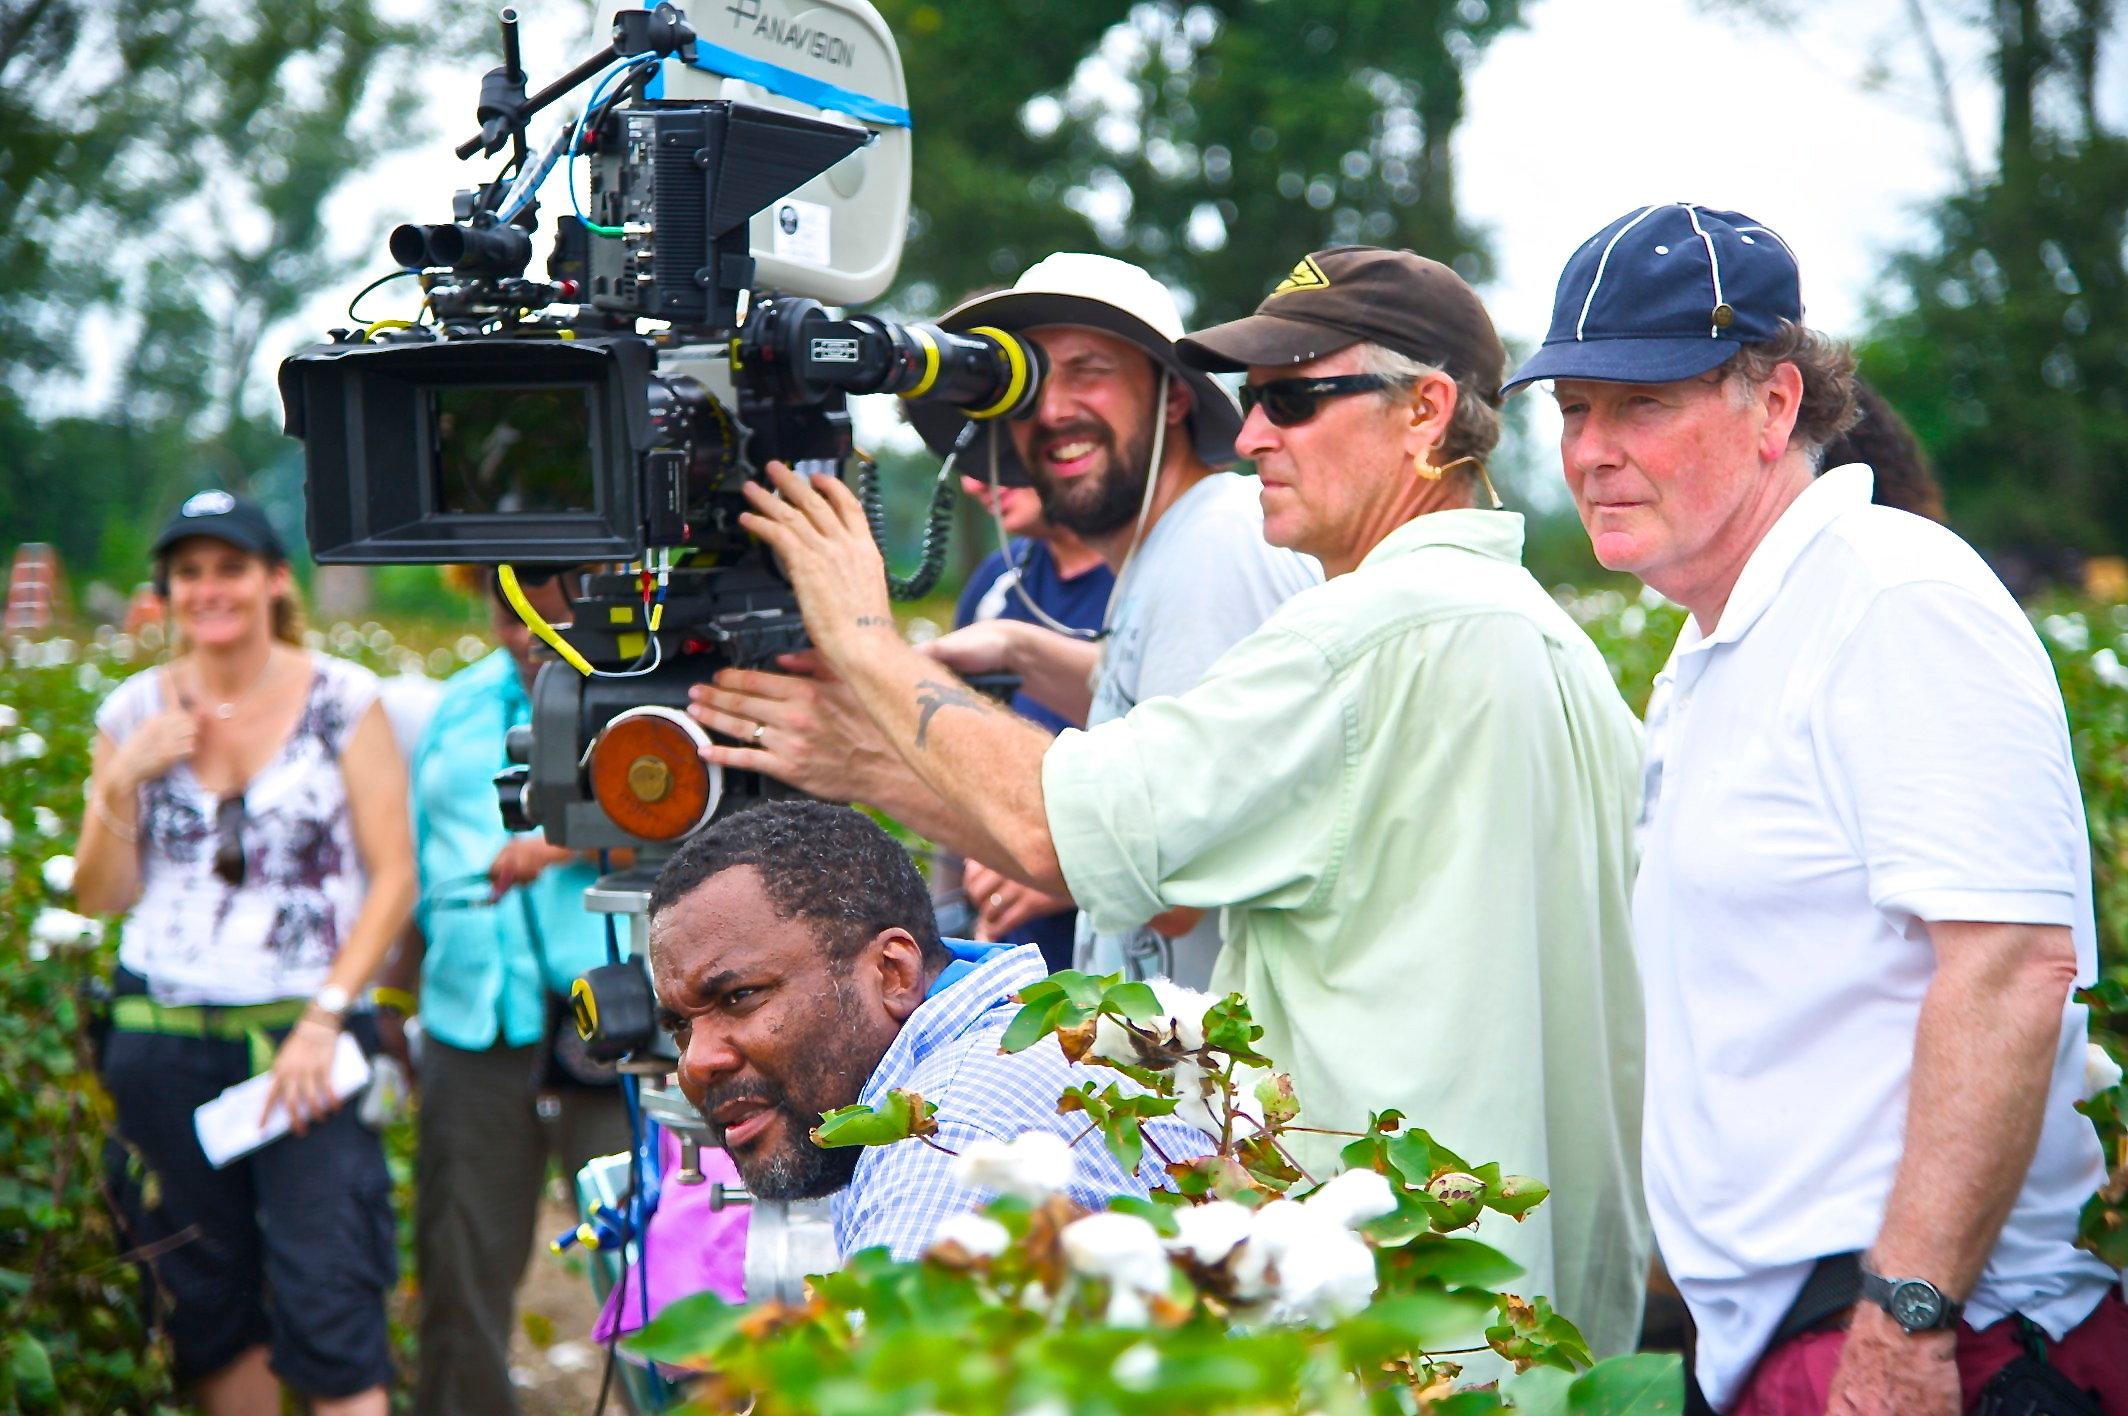 Director Lee Daniels